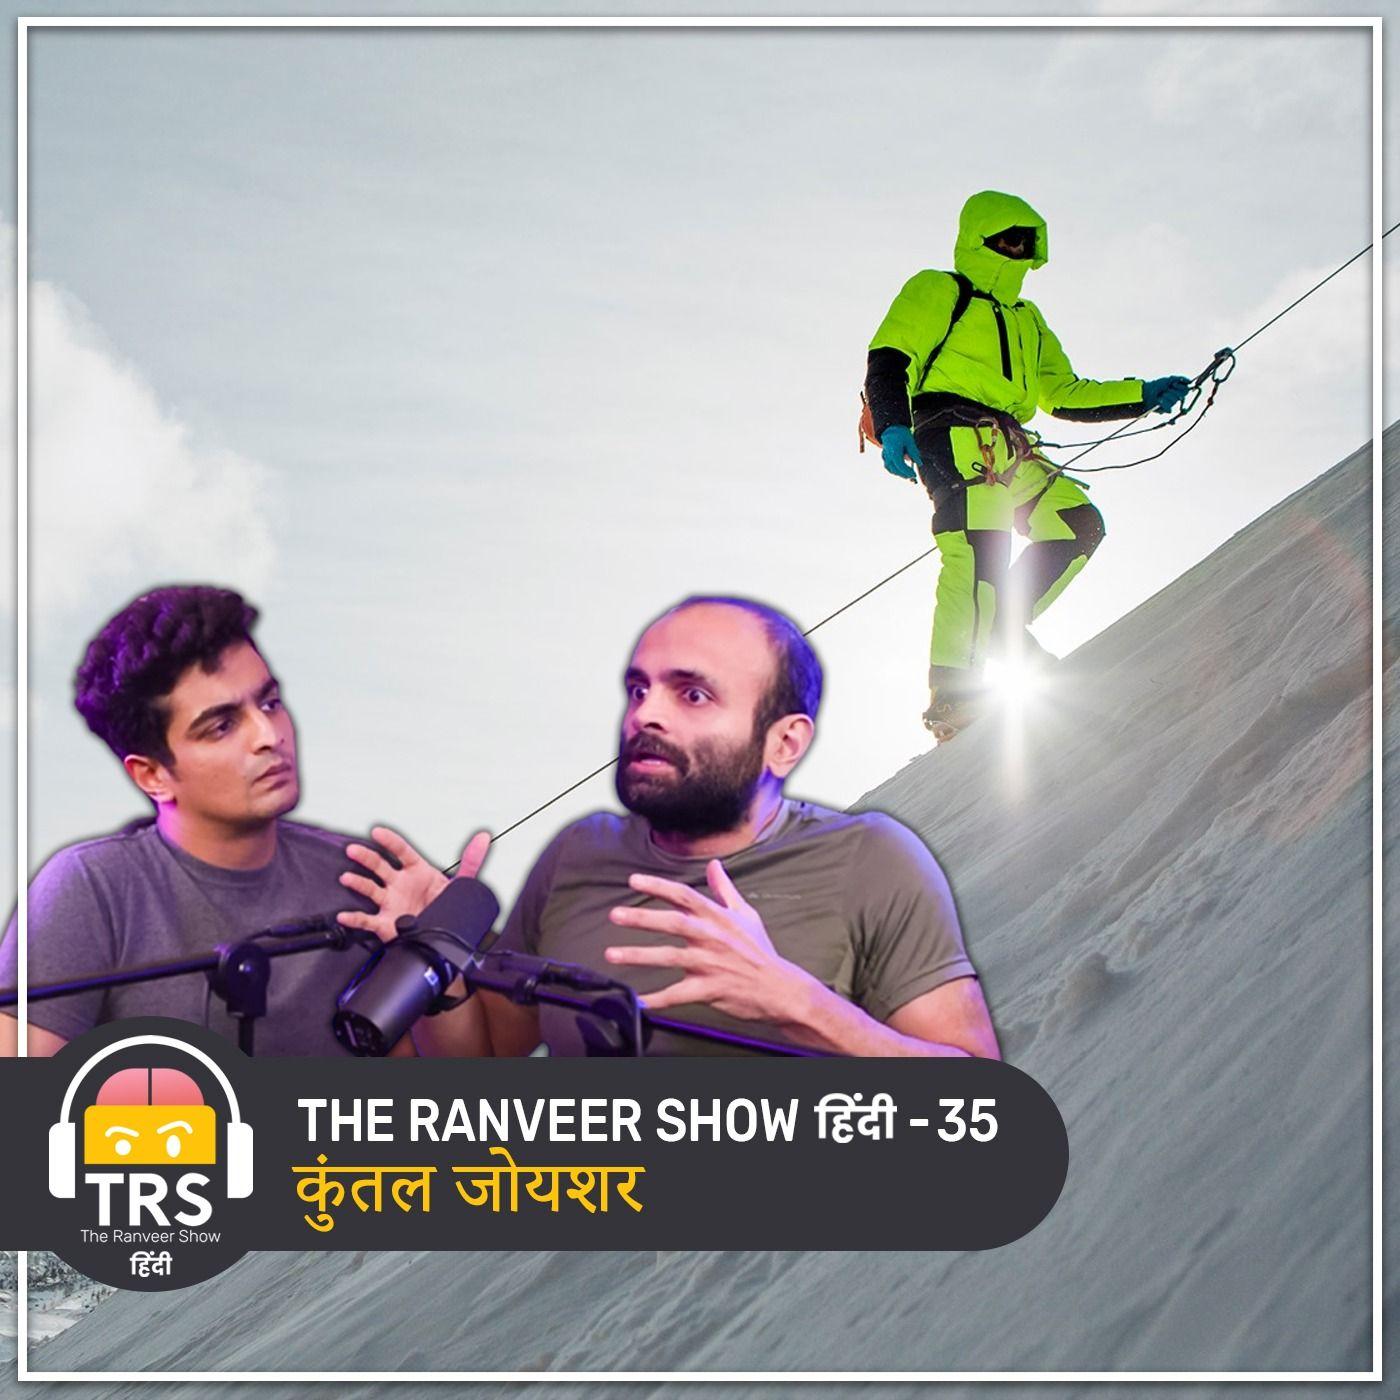 MAUT Ka Saamna - Everest Climber's SCARY Stories ft. Kuntal Joisher | The Ranveer Show हिंदी 35